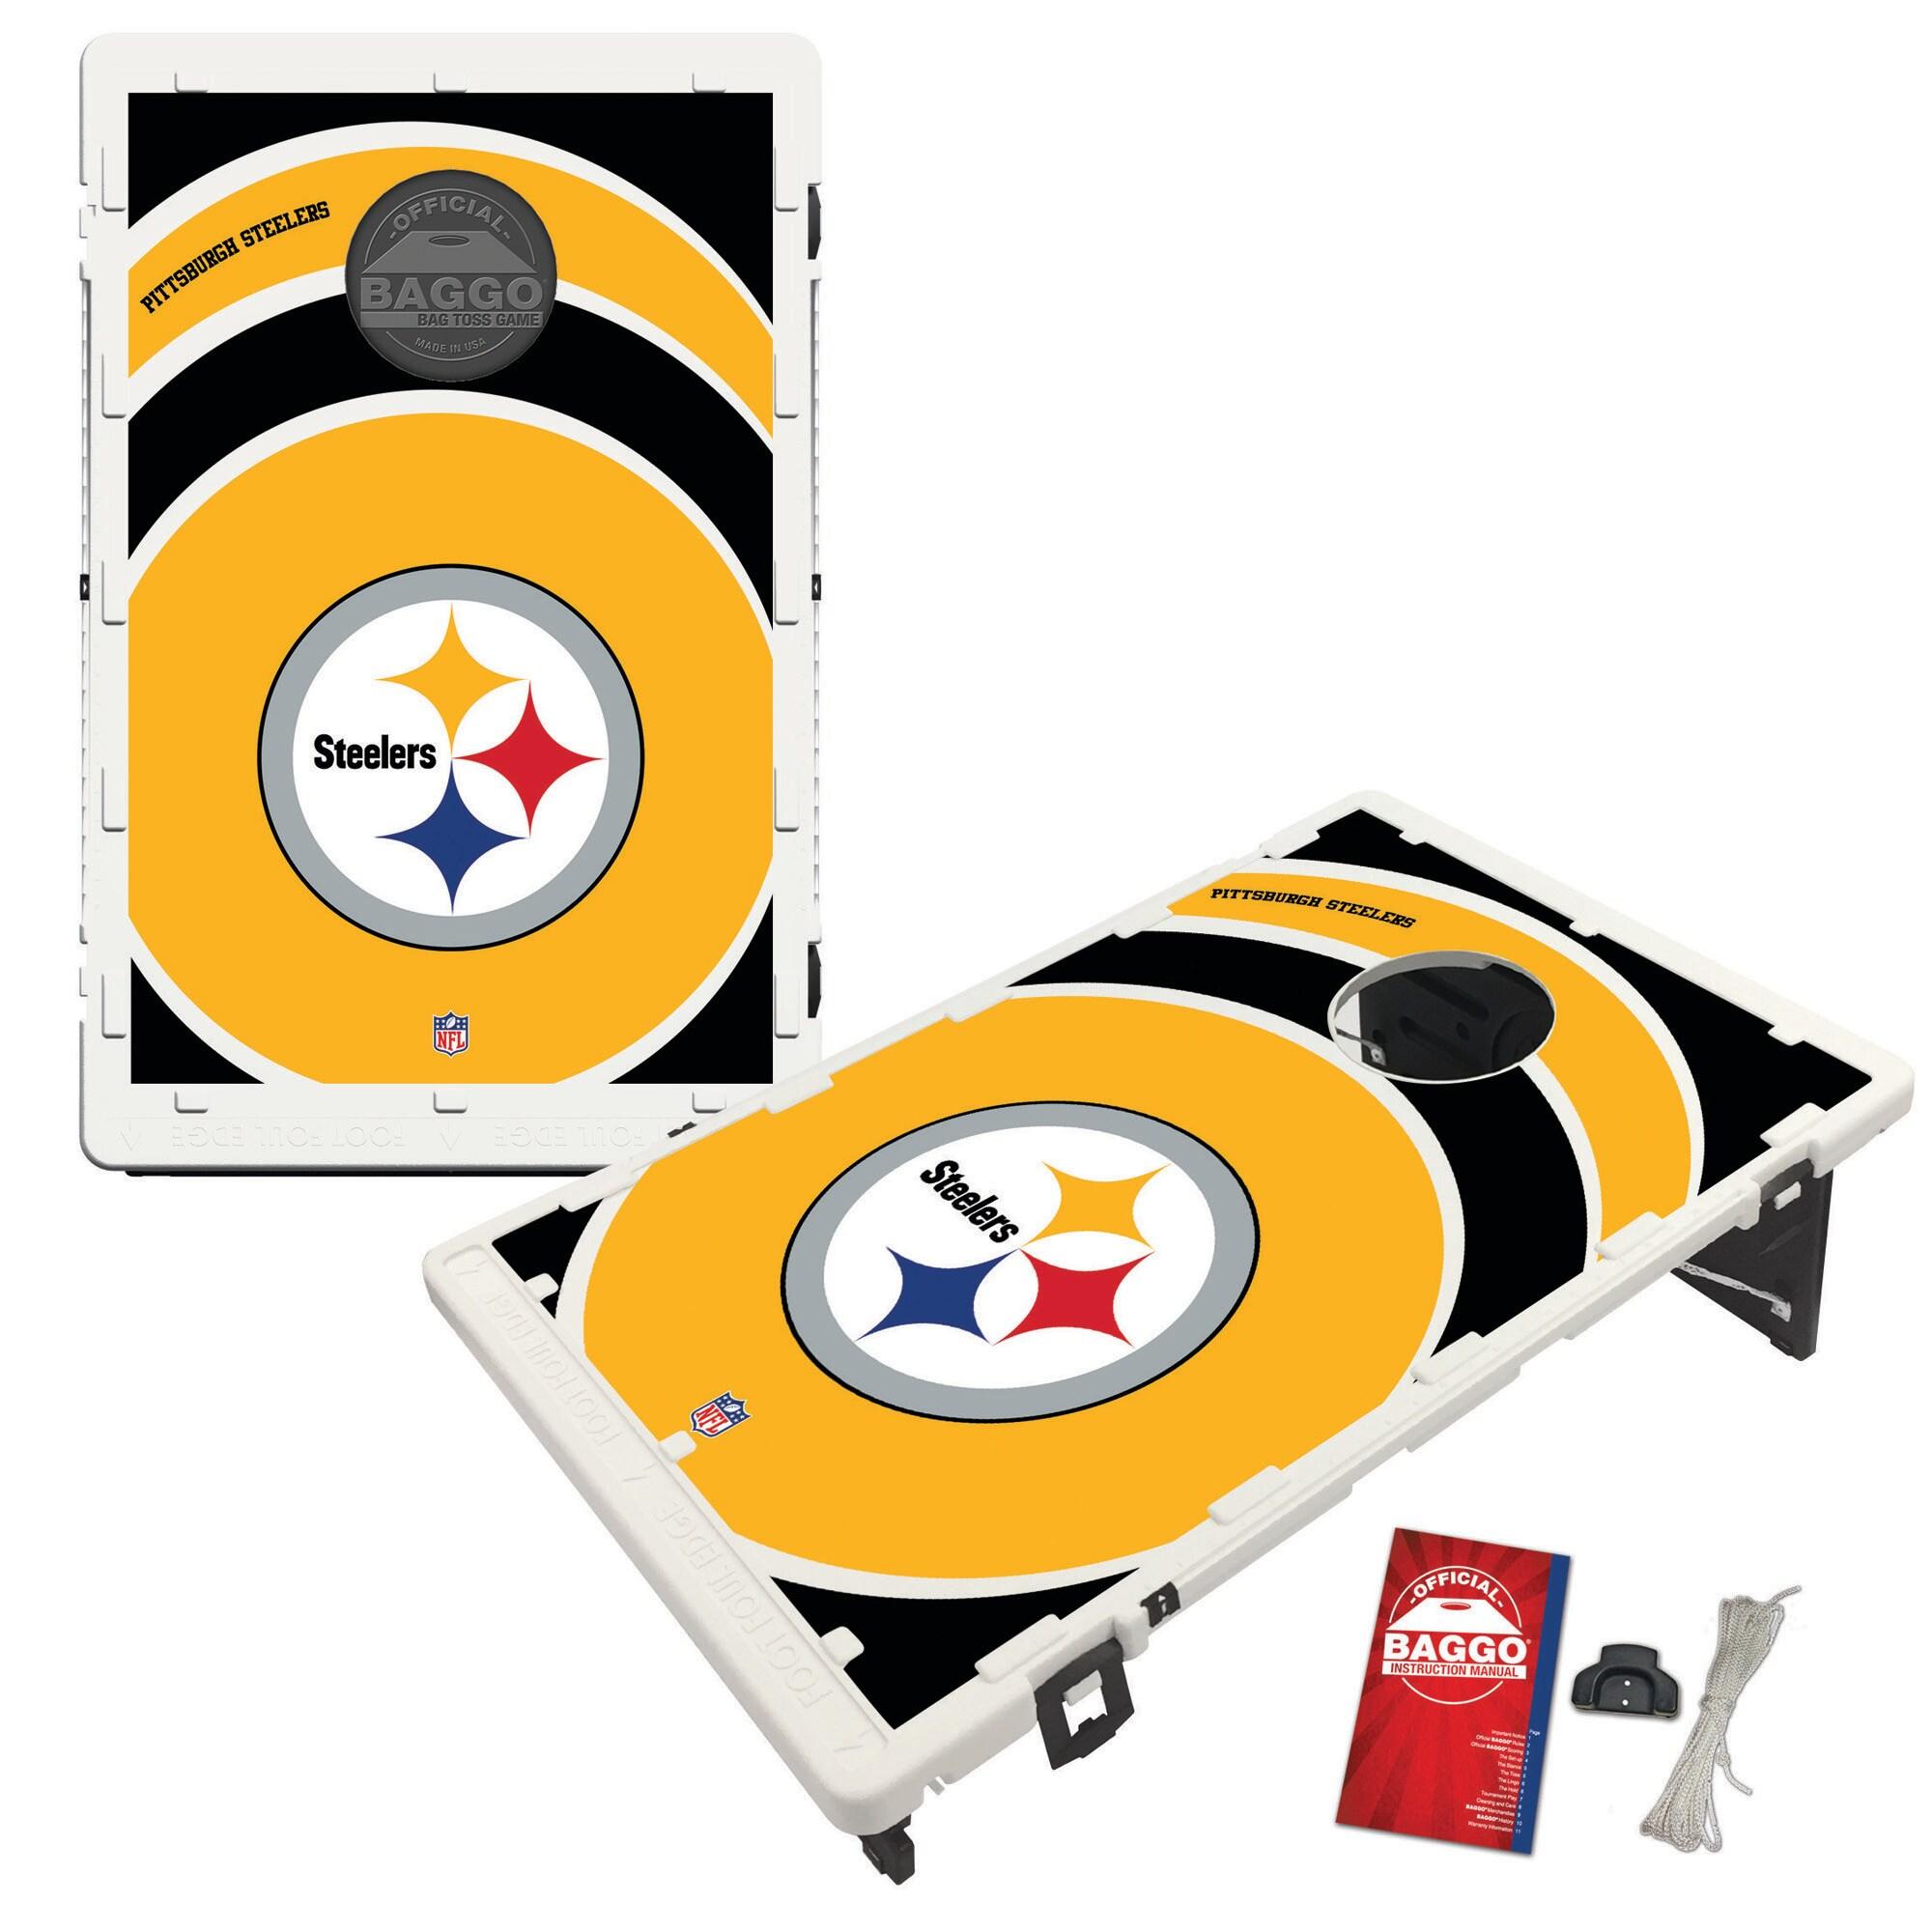 Pittsburgh Steelers 2' x 3' BAGGO Vortex Cornhole Board Tailgate Toss Set